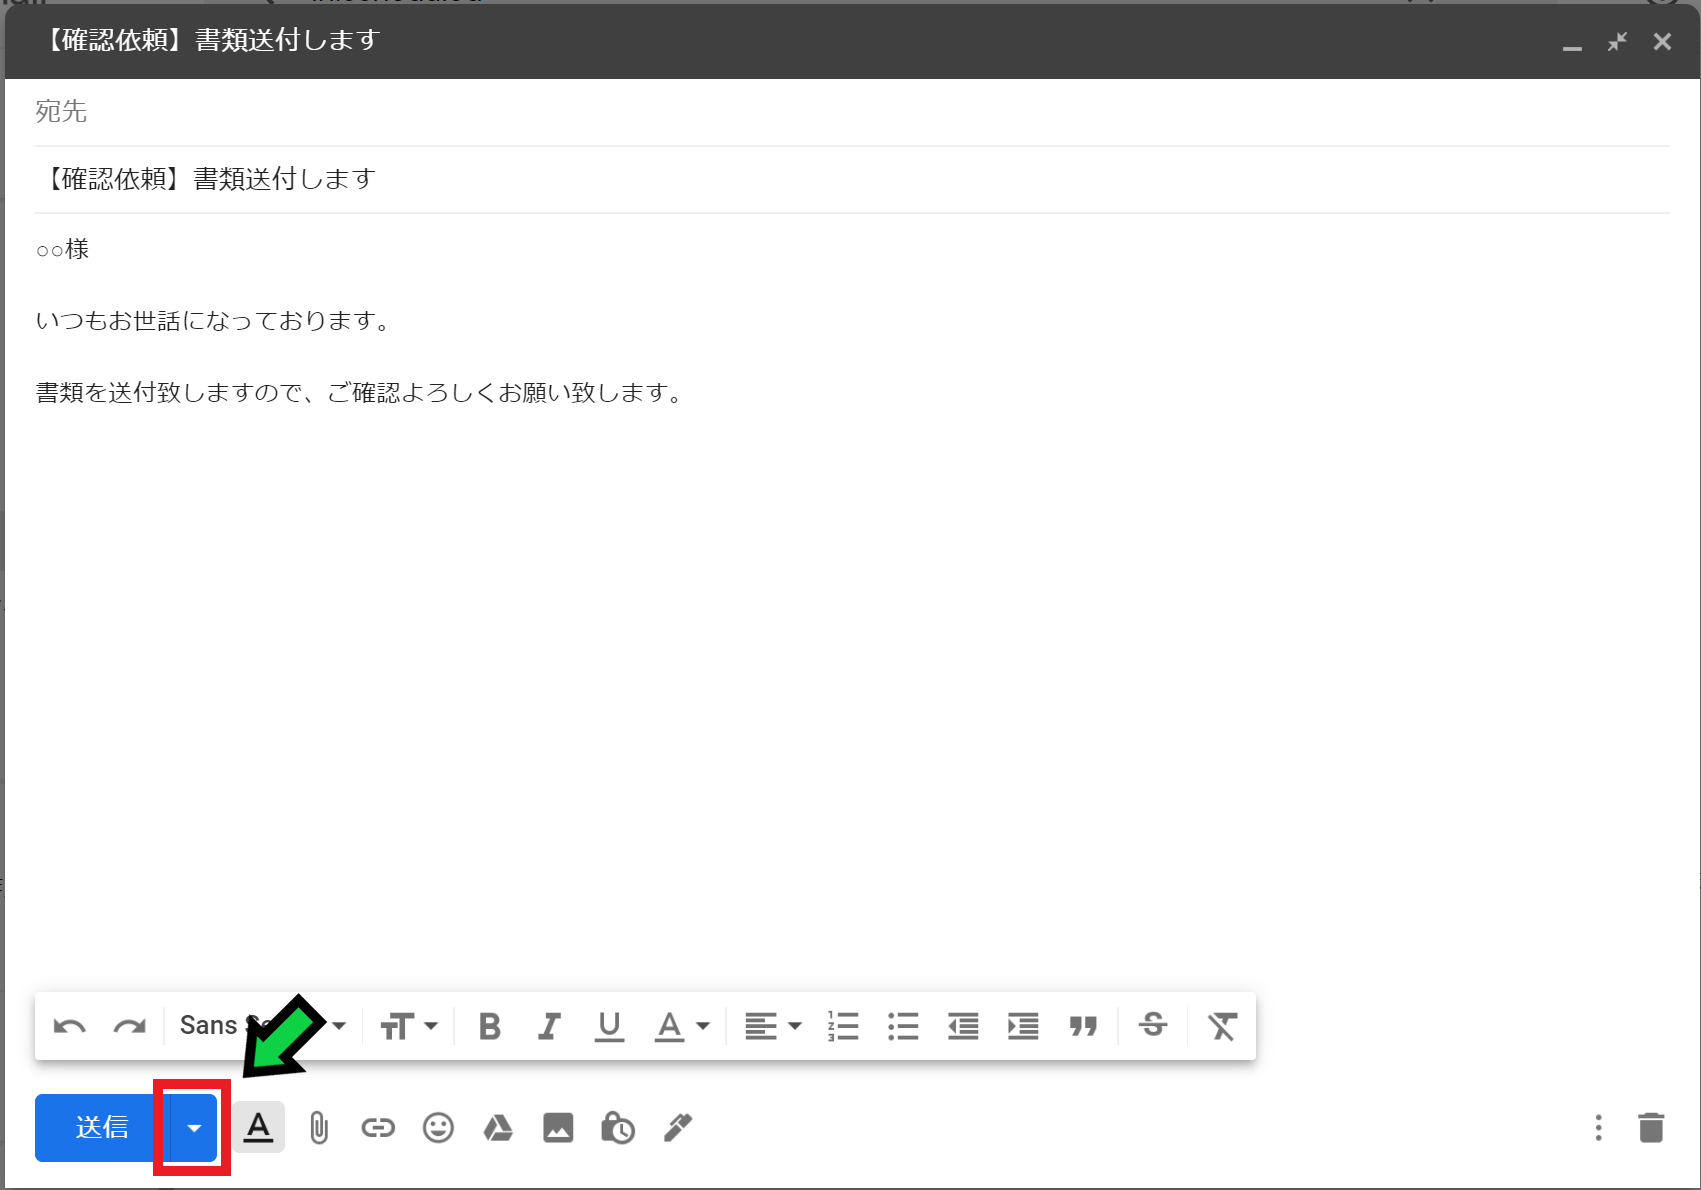 【Gmail】メールを予約送信する方法【営業時間外にメール作成する方にオススメ】